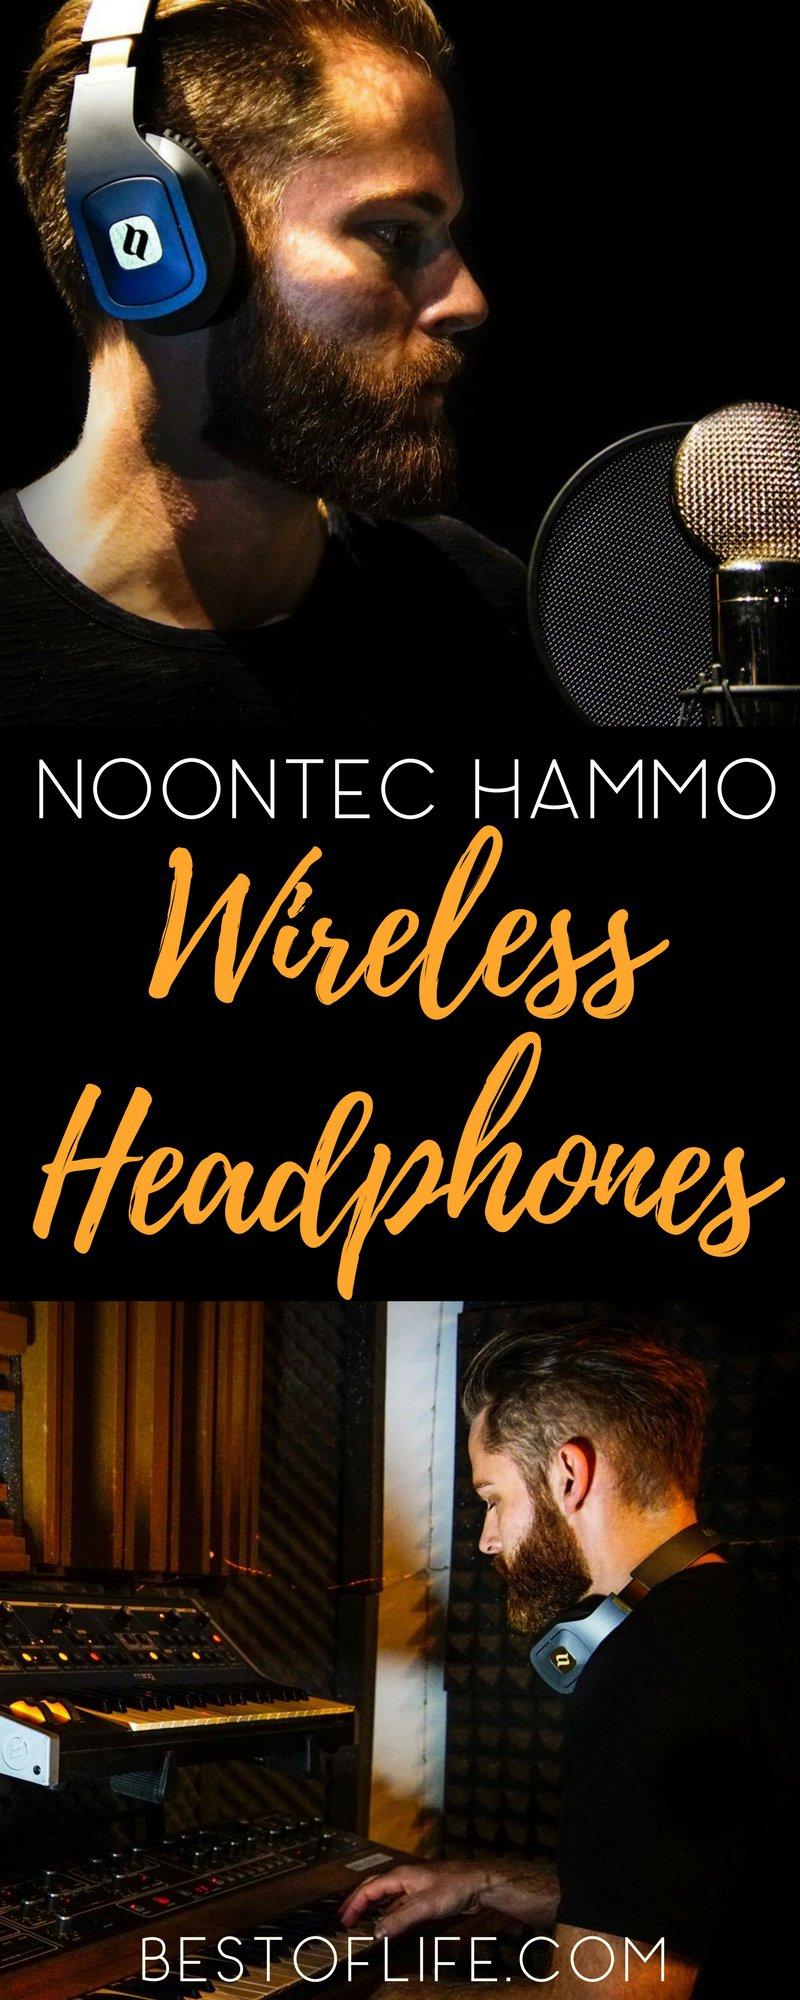 When it comes to providing a great way to listen to music the way it should be heard Noontec Hammo Wireless Headphones succeeds. Best Headphones | Headphones | wireless Headphones | Bluetooth Headphones | Best Bluetooth Headphones | Best Tech | Tech Gifts | Noontec | Hammo Headphones